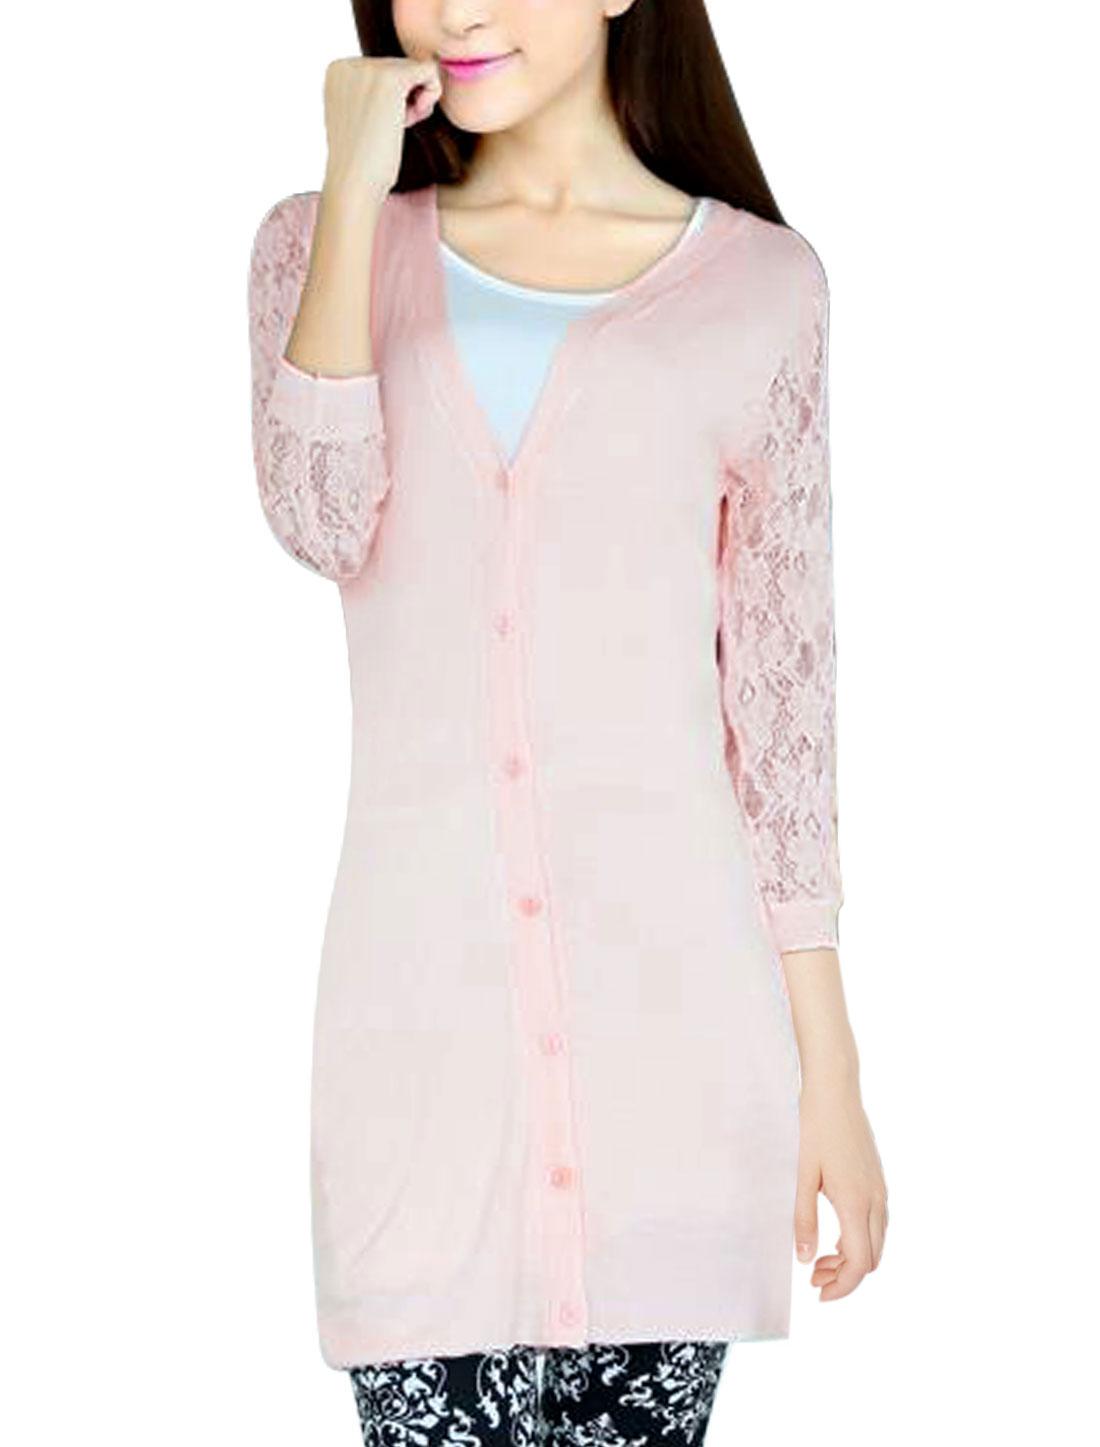 Women Lace Panel Design V Neck Button Closure Knit Cardigan Pale Pink S